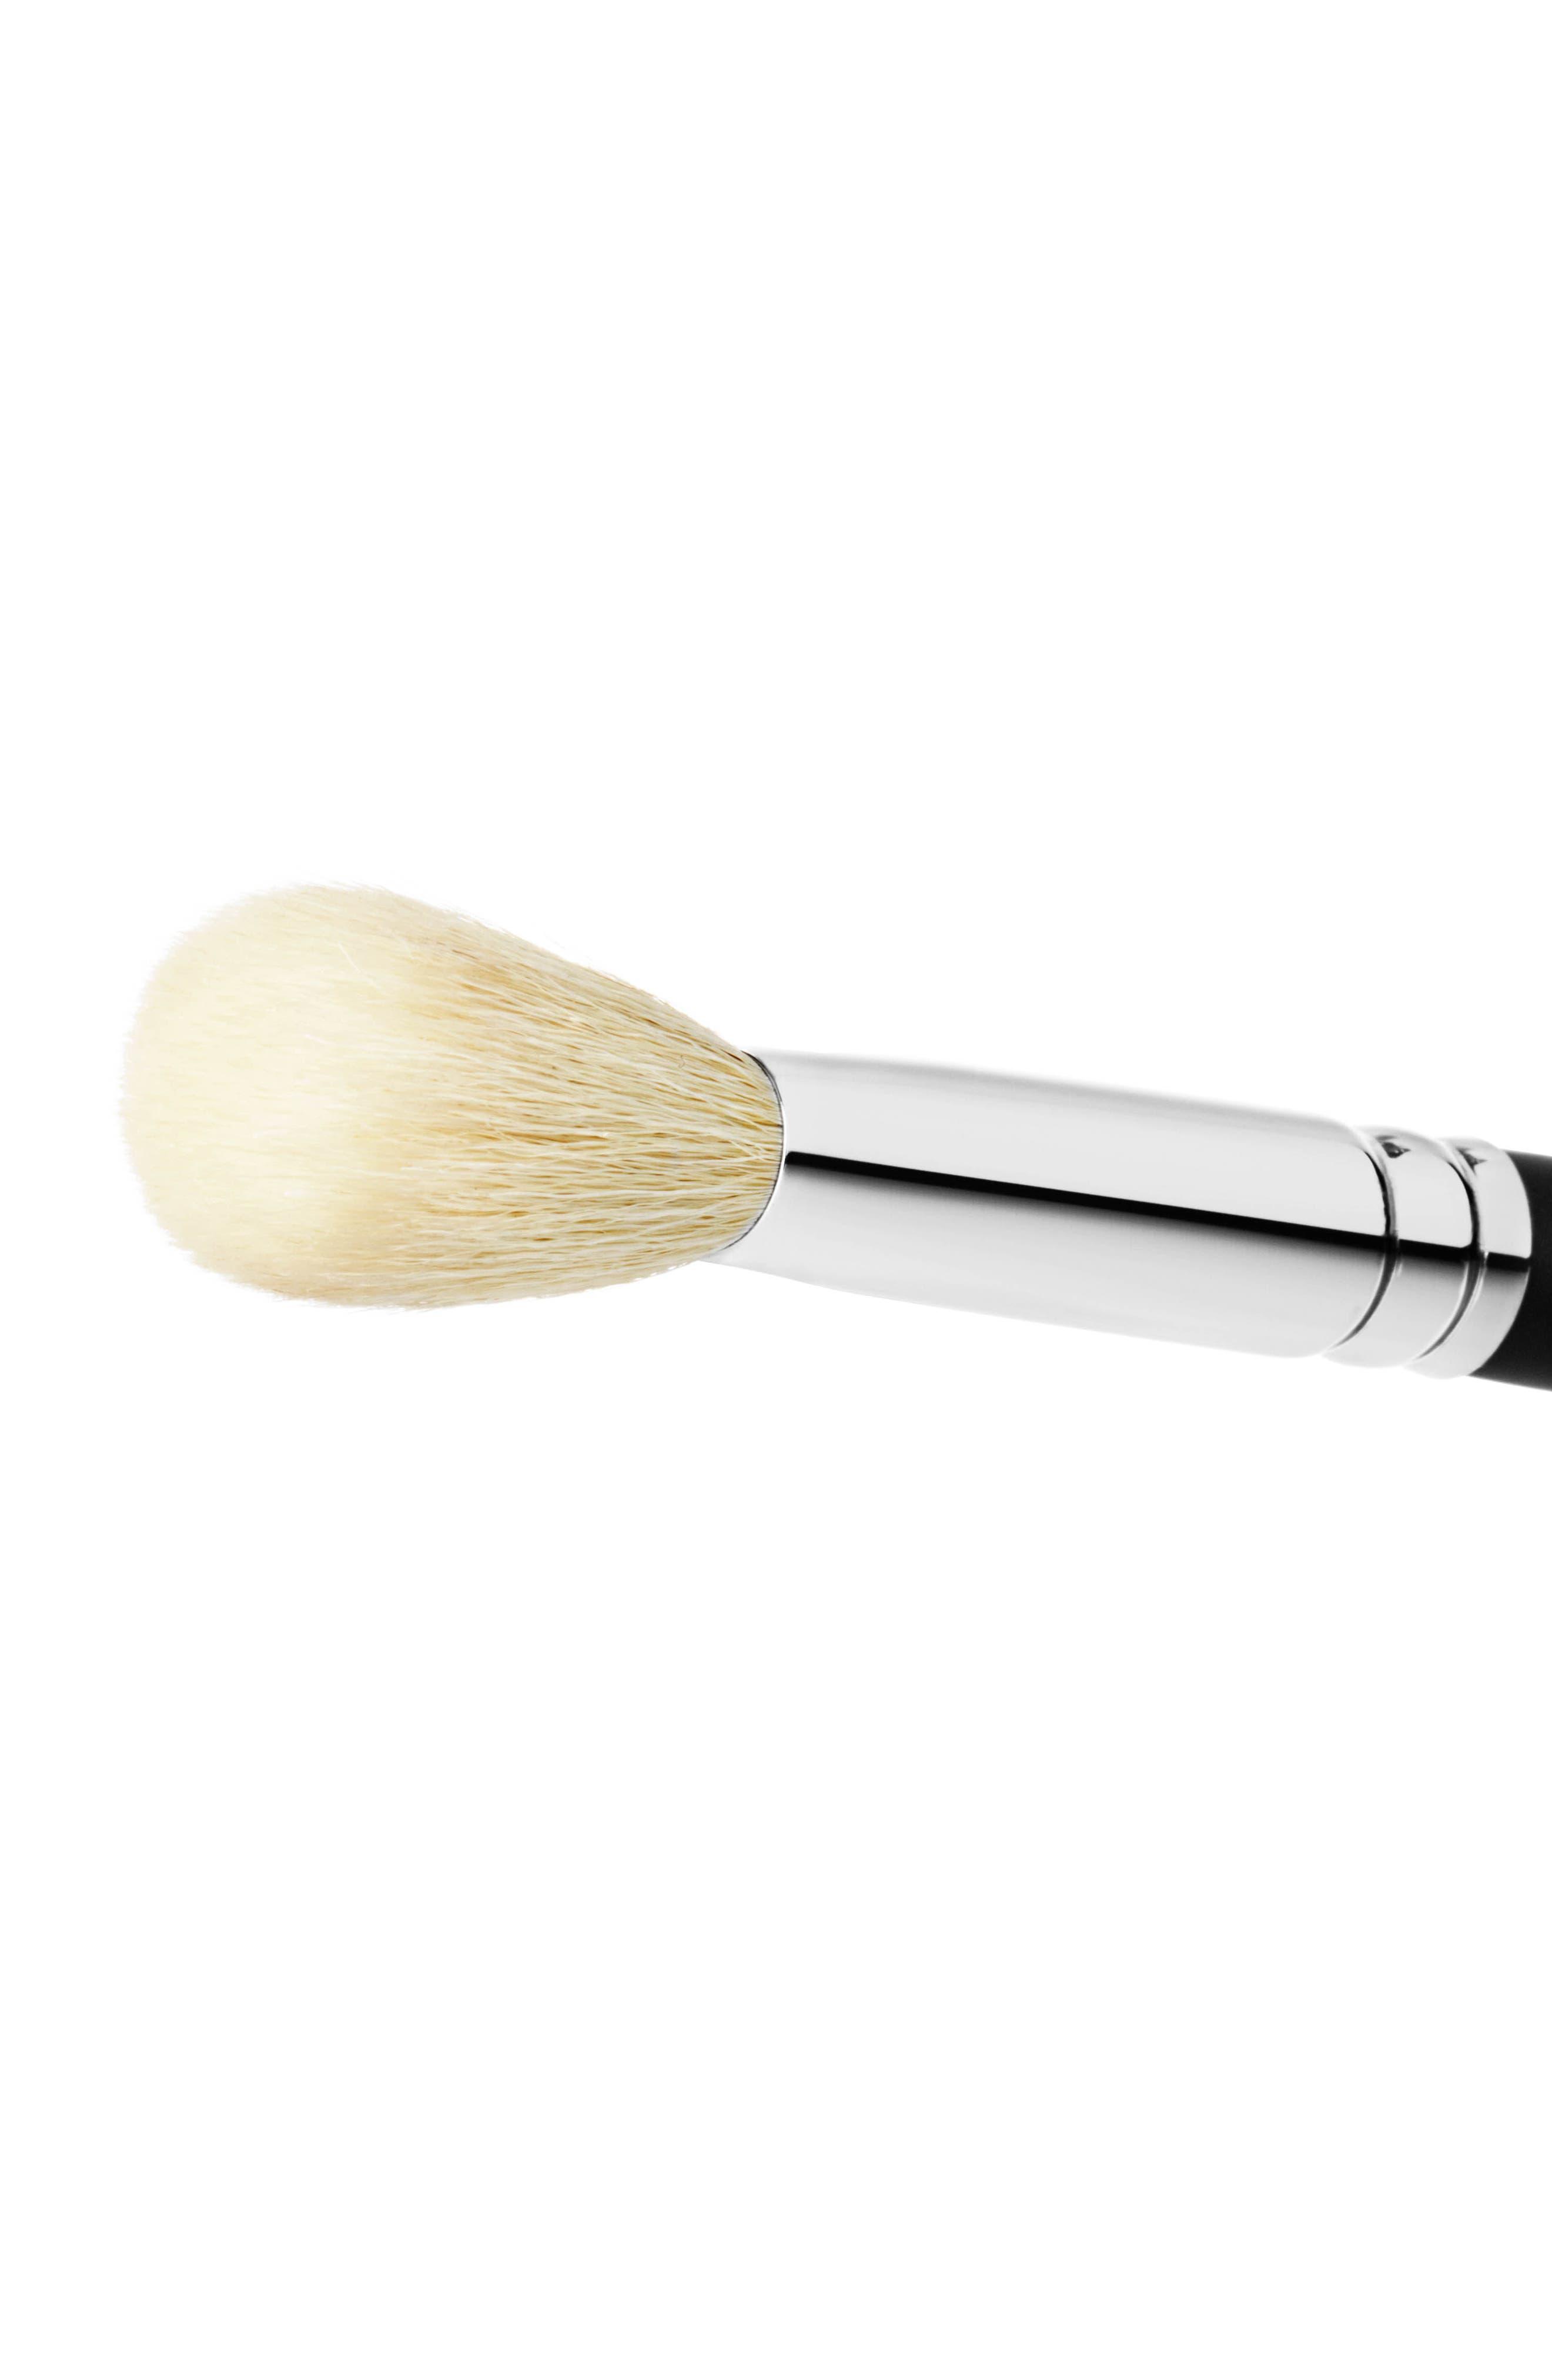 MAC 137S Synthetic Long Blending Brush,                             Alternate thumbnail 2, color,                             000